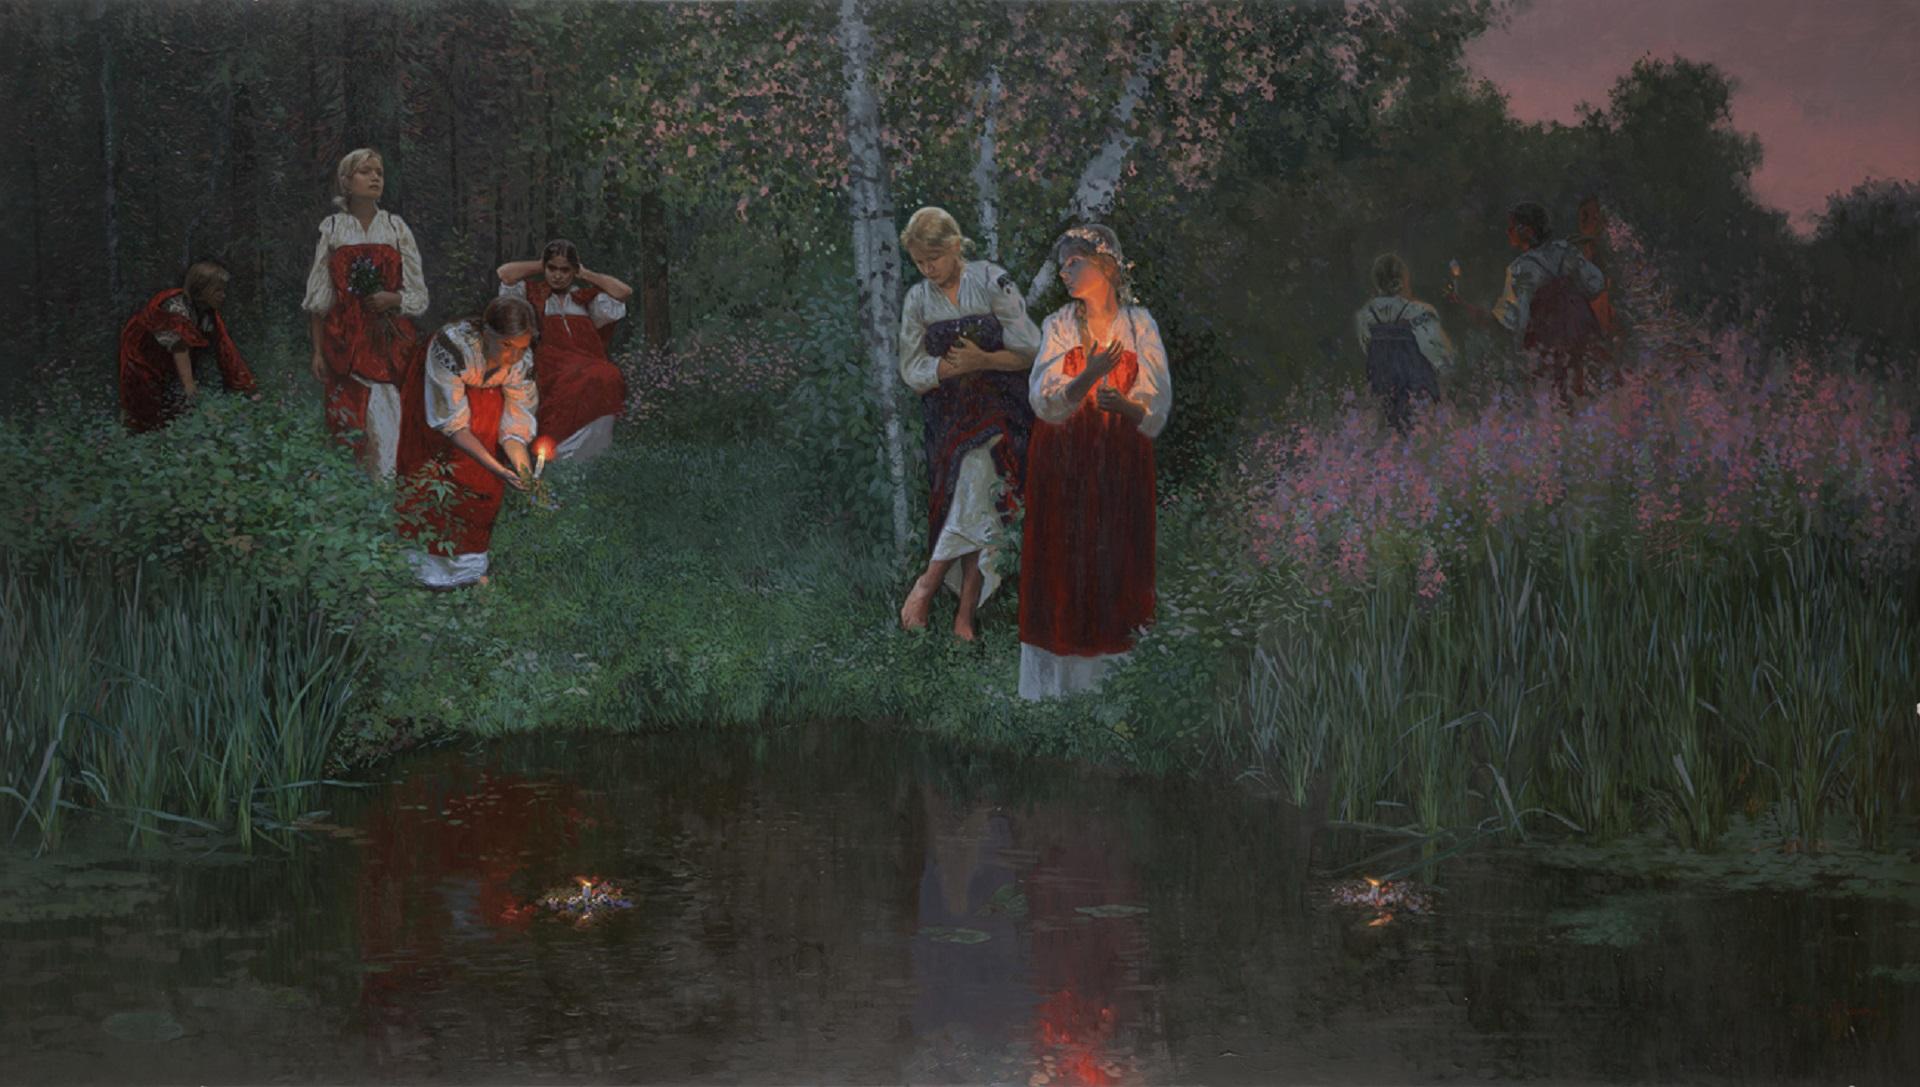 Ritualna kupanja, pletenje venaca i preskakanje vatri: Dočekujemo Kupala ili nam se smeši Ivanjdan